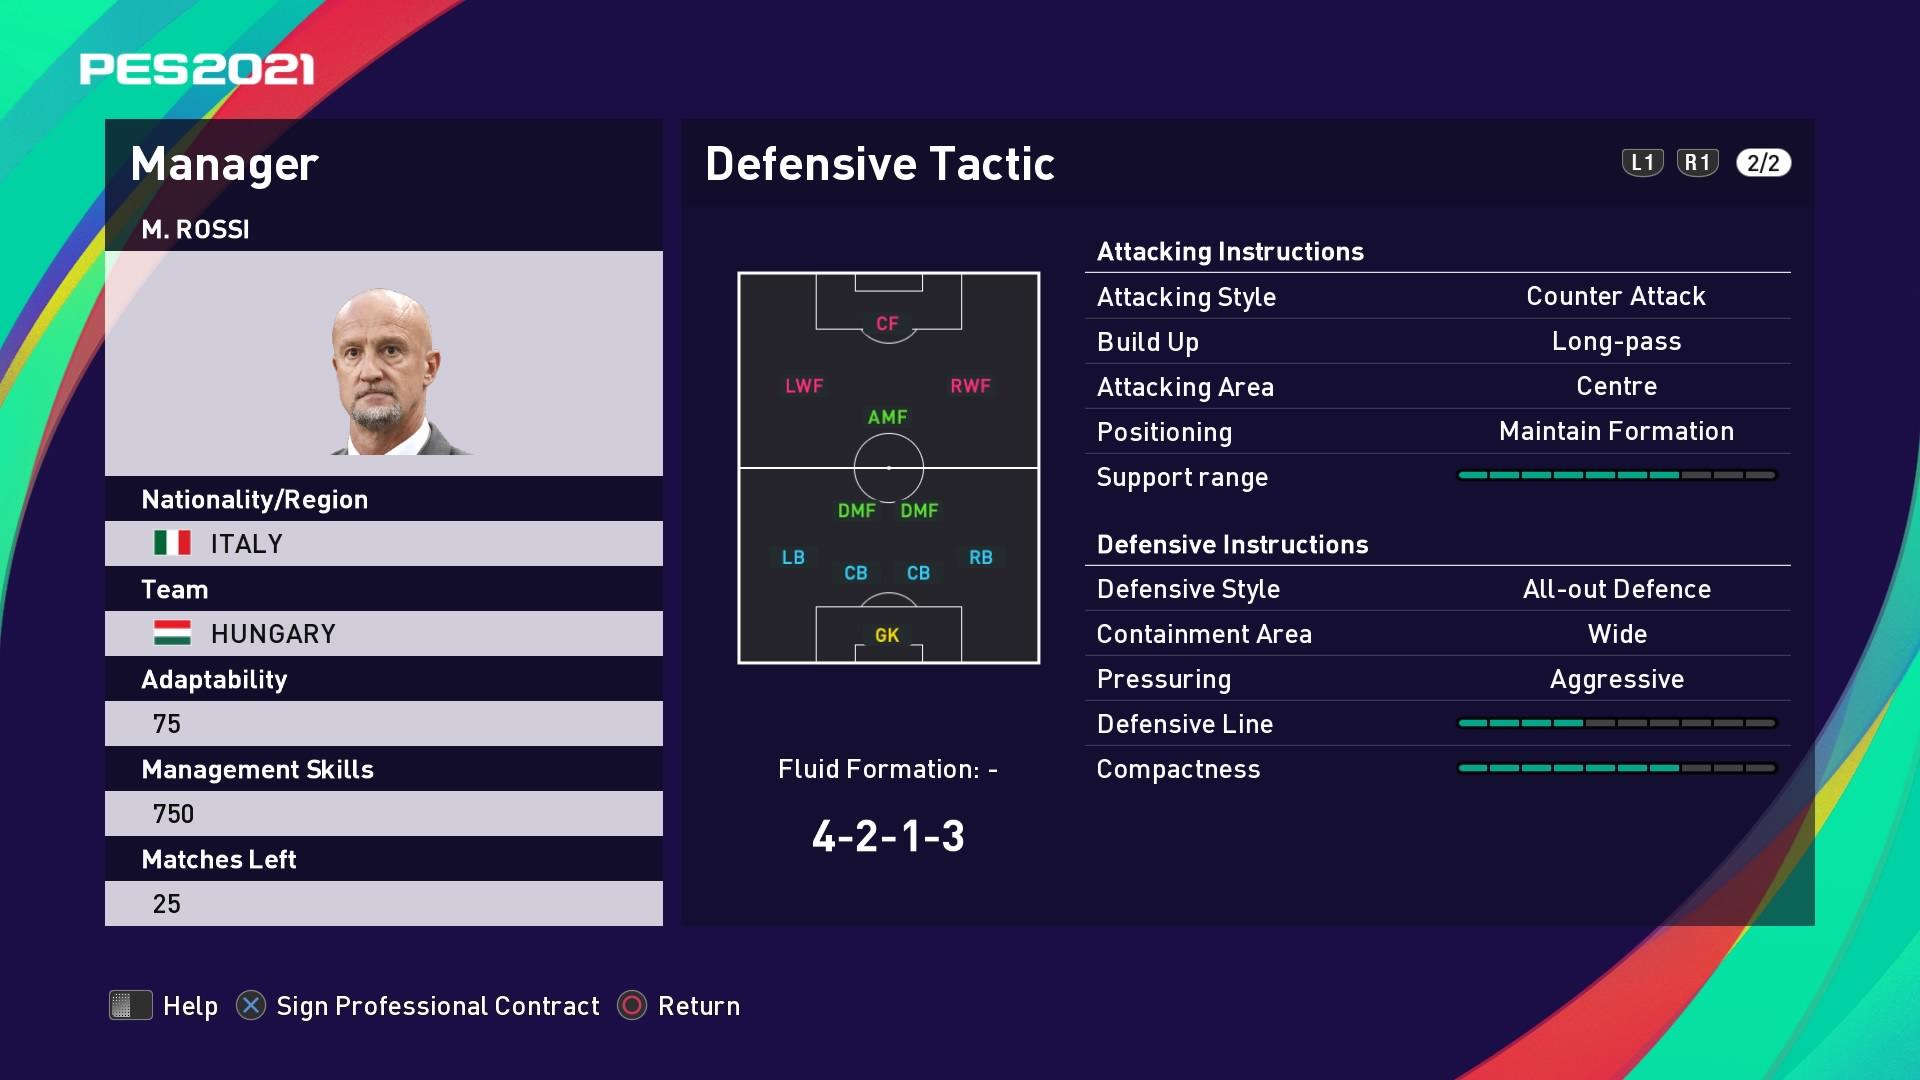 M. Rossi (Marco Rossi) Defensive Tactic in PES 2021 myClub